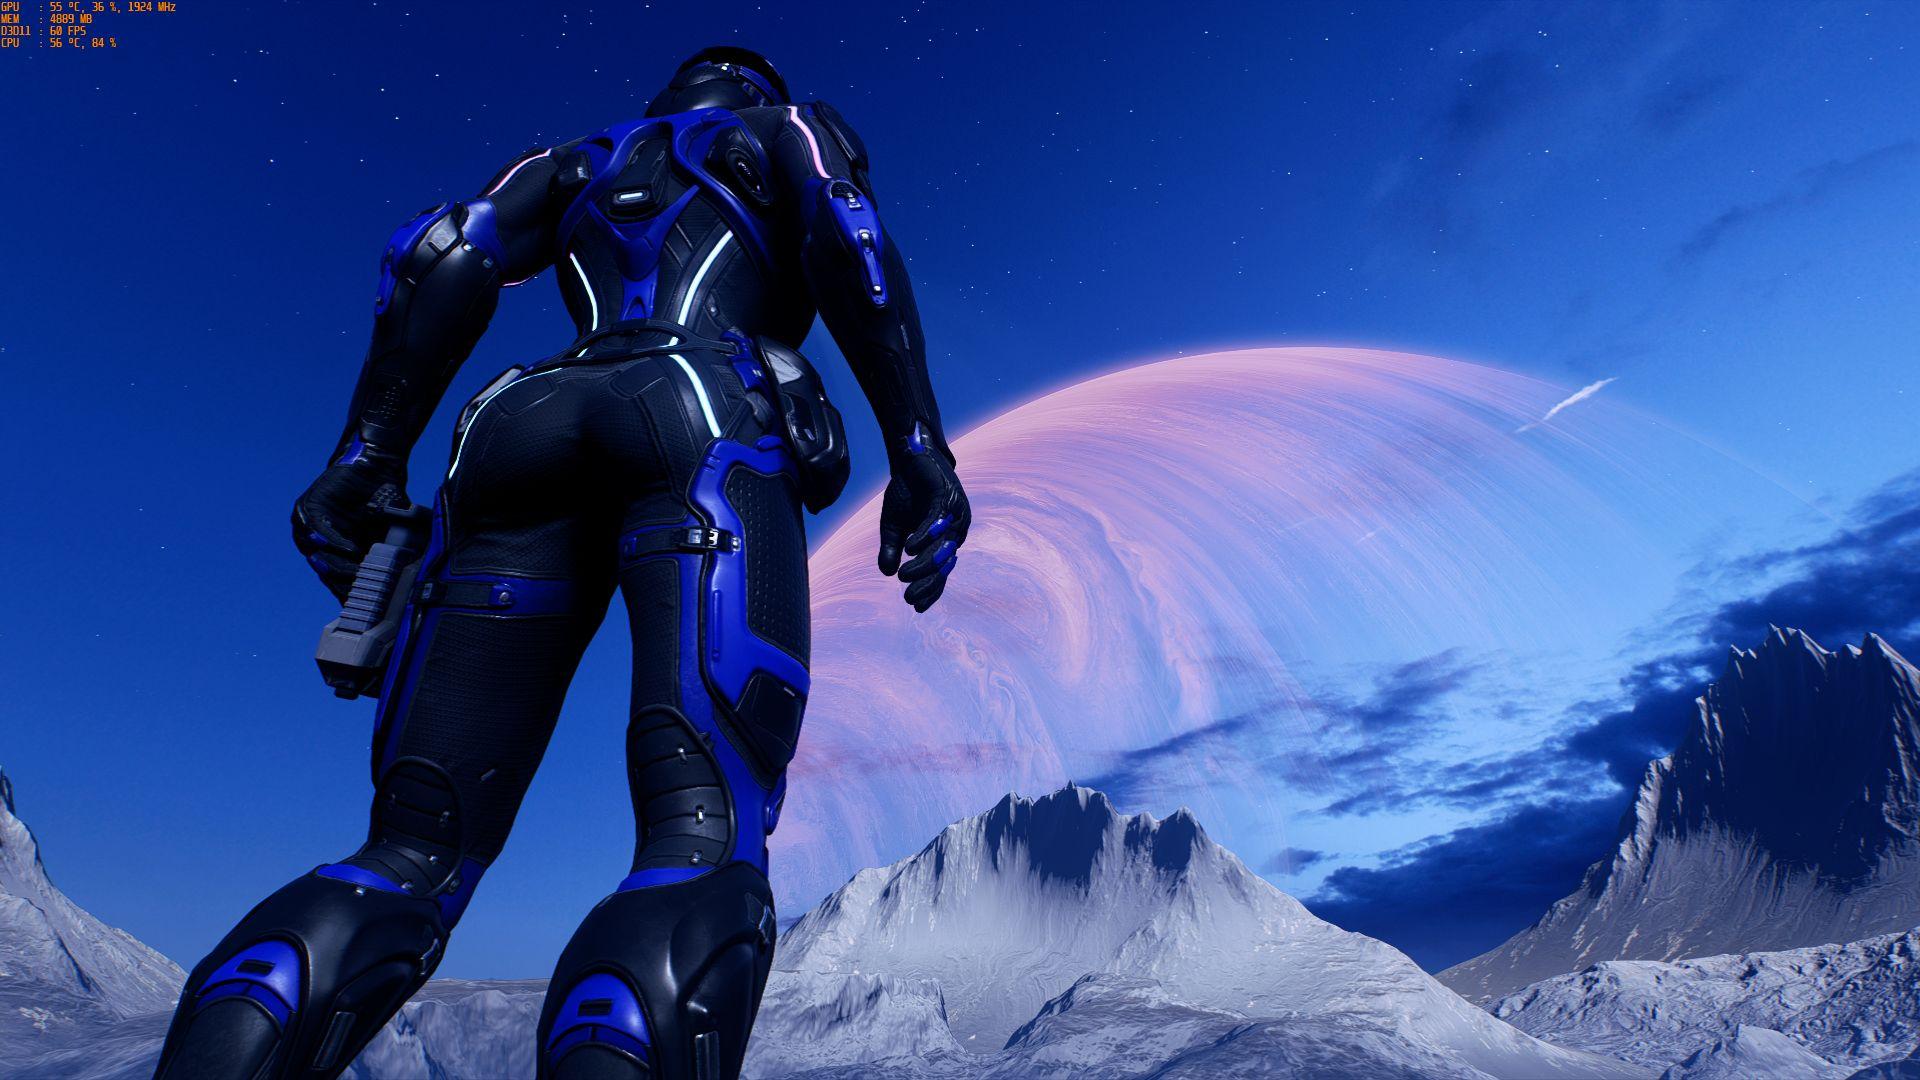 Mass Effect Andromeda Screenshot 2017.07.30 - 17.58.45.34.jpg - Mass Effect: Andromeda